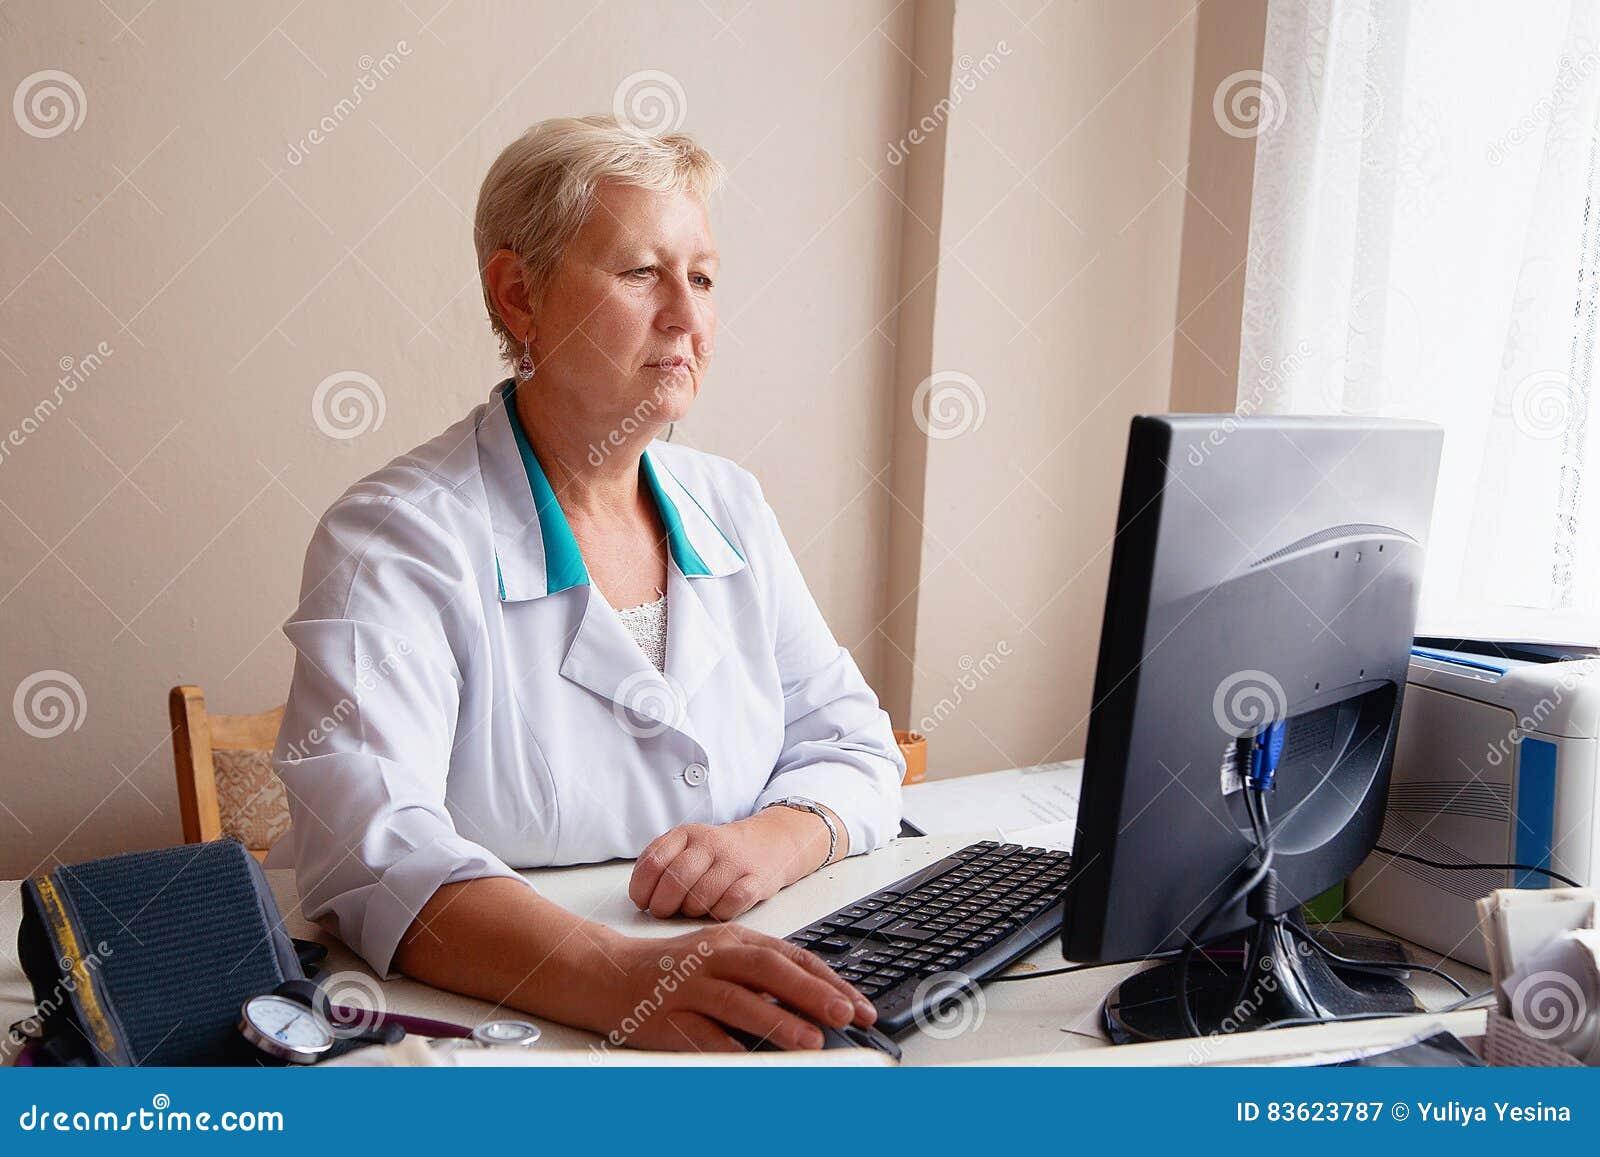 Attraktiv kvinnlig doktor som arbetar på hennes dator i hennes kontor